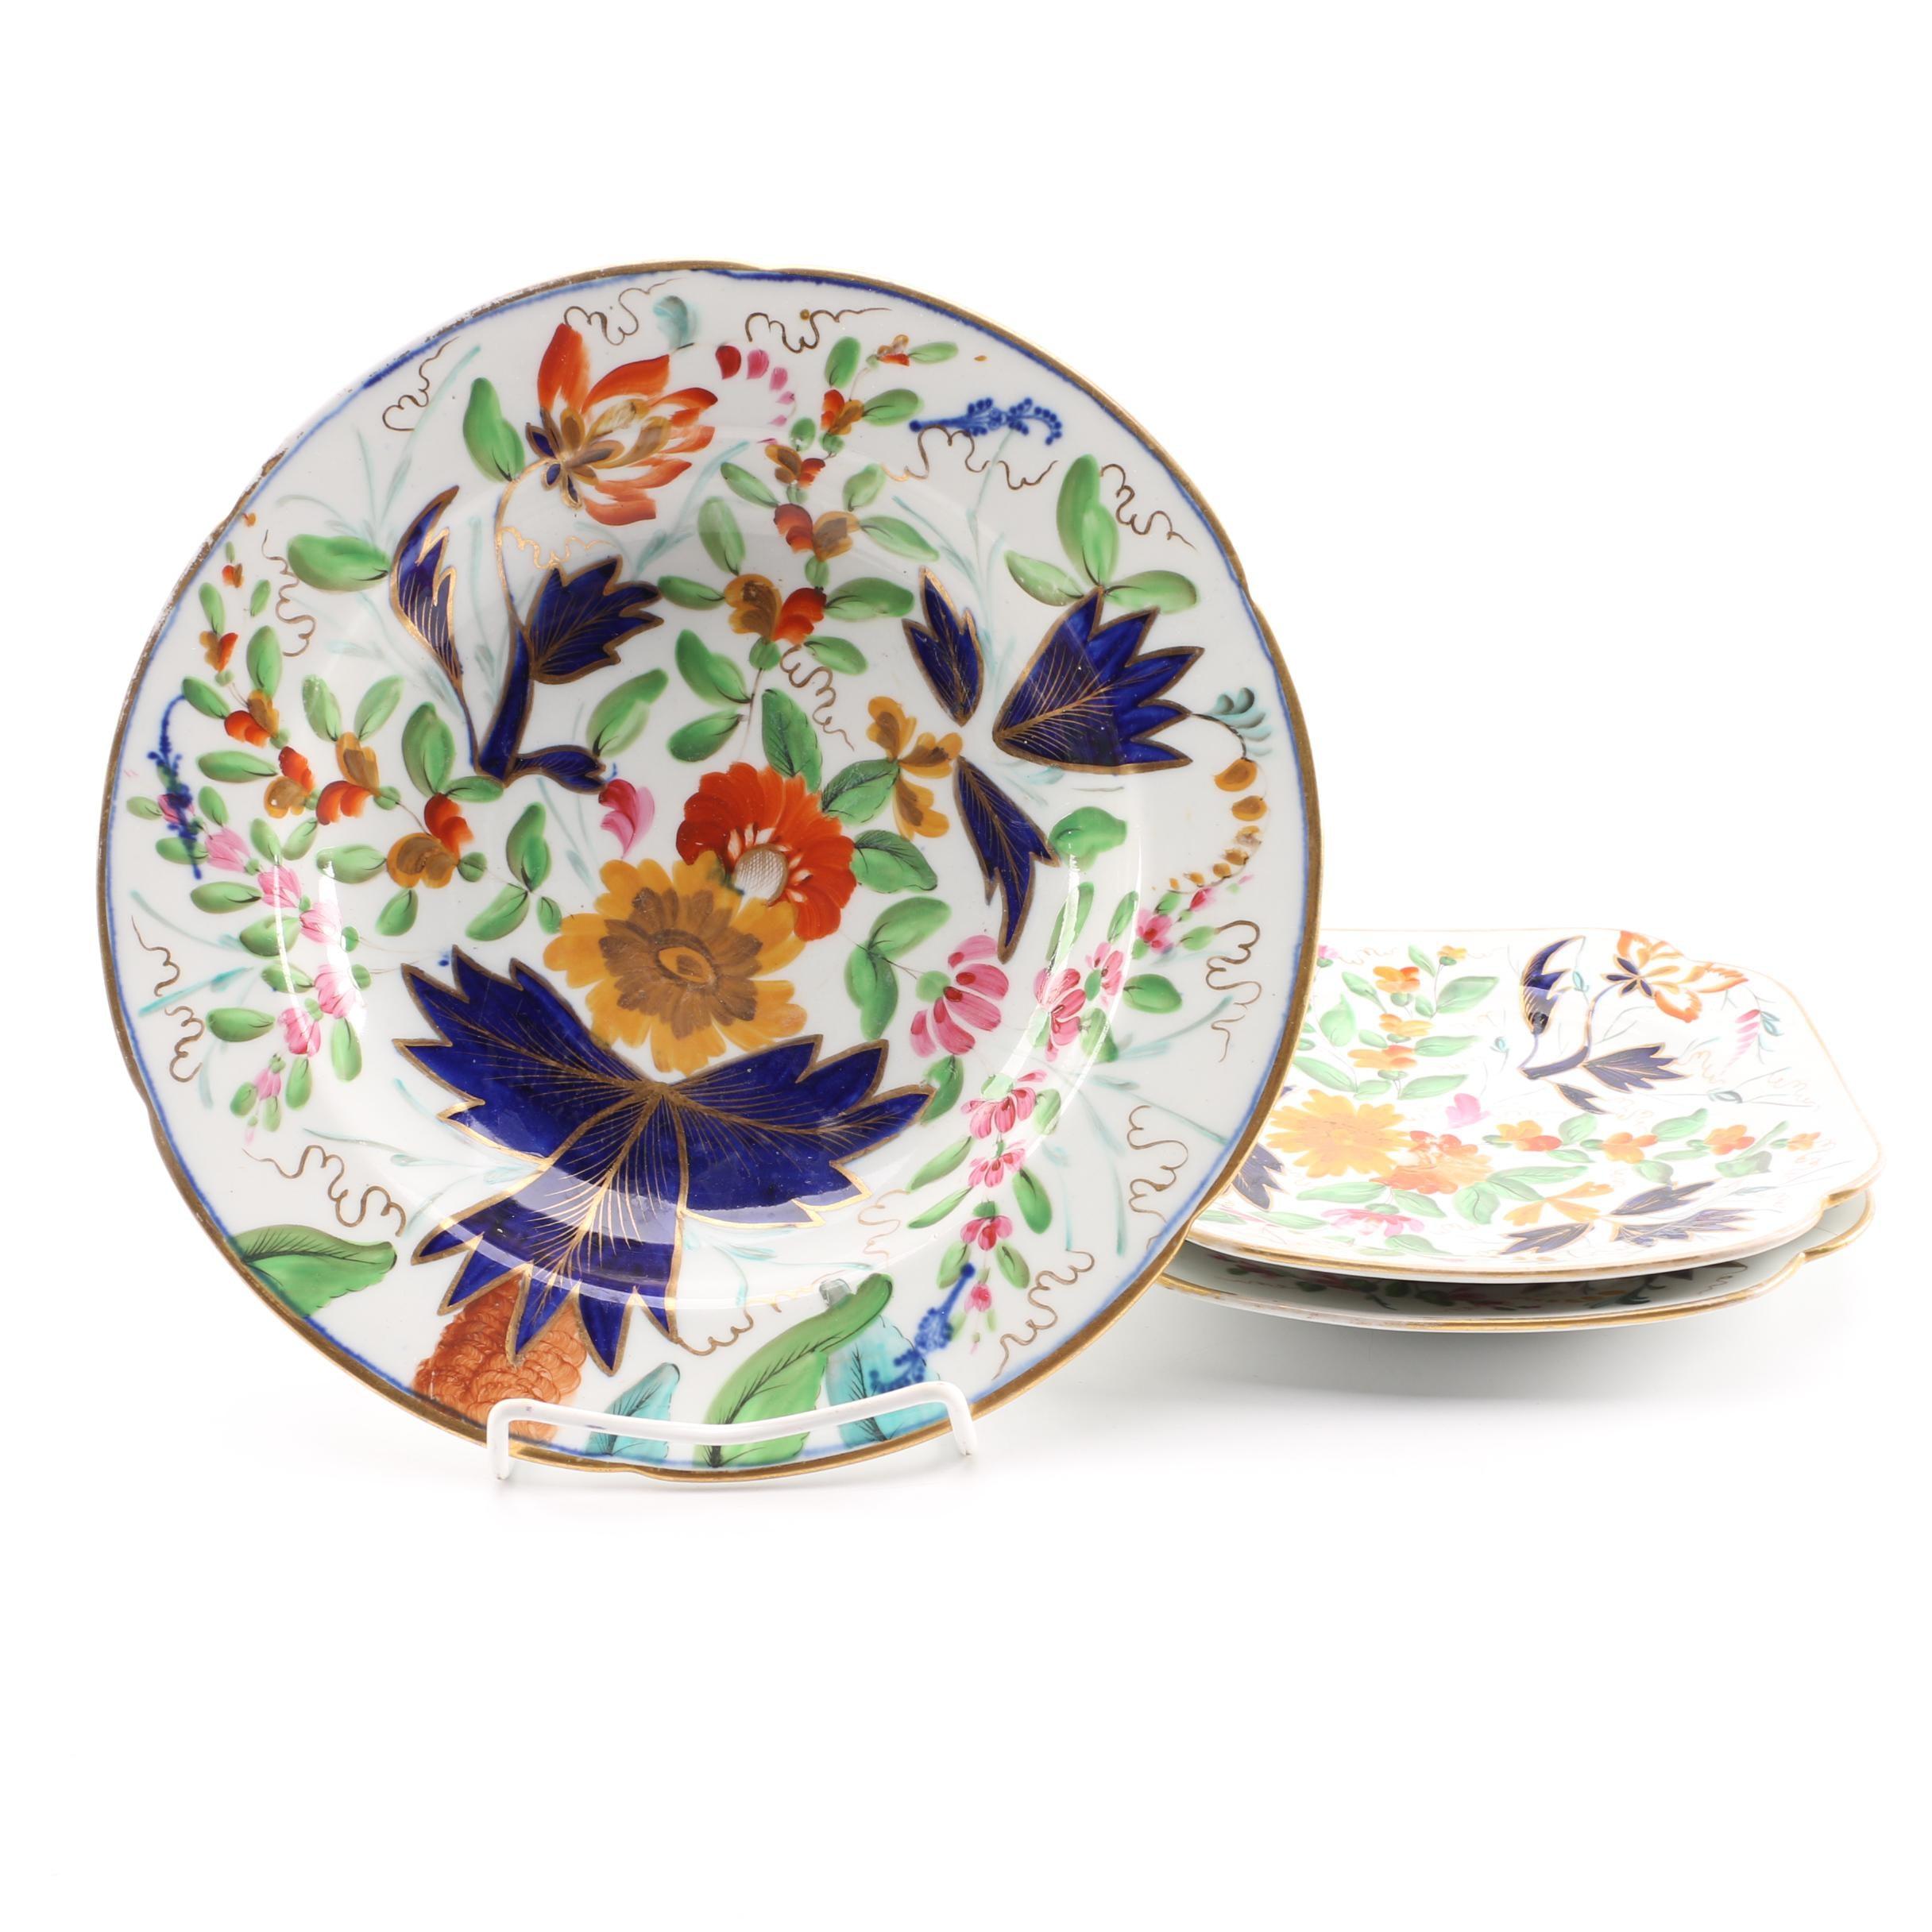 Floral Motif Decorative Ceramic Plates